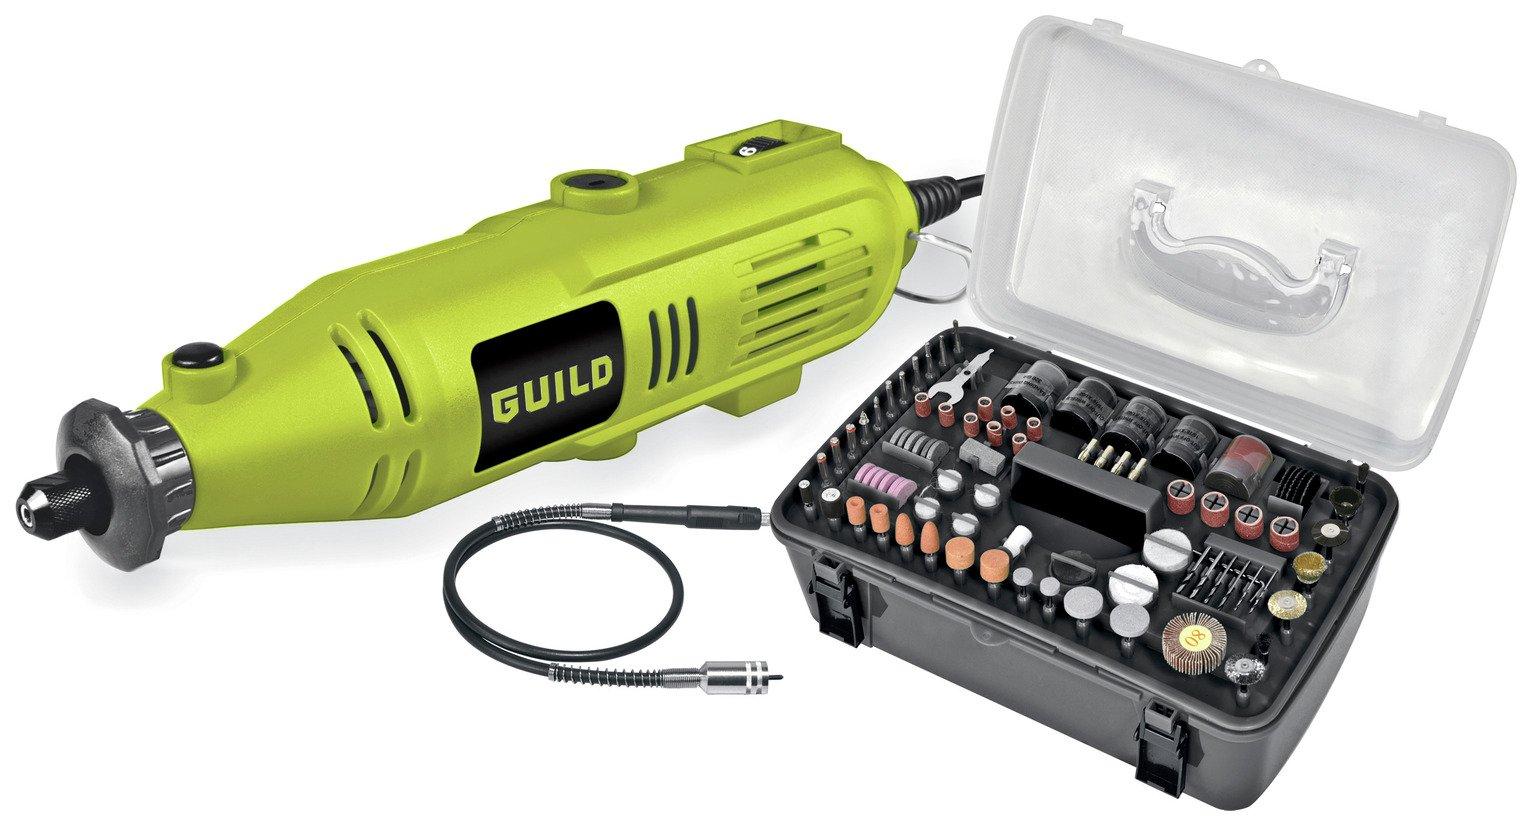 Buy Guild 218 Piece Mini Tool Kit | Tool accessories | Argos